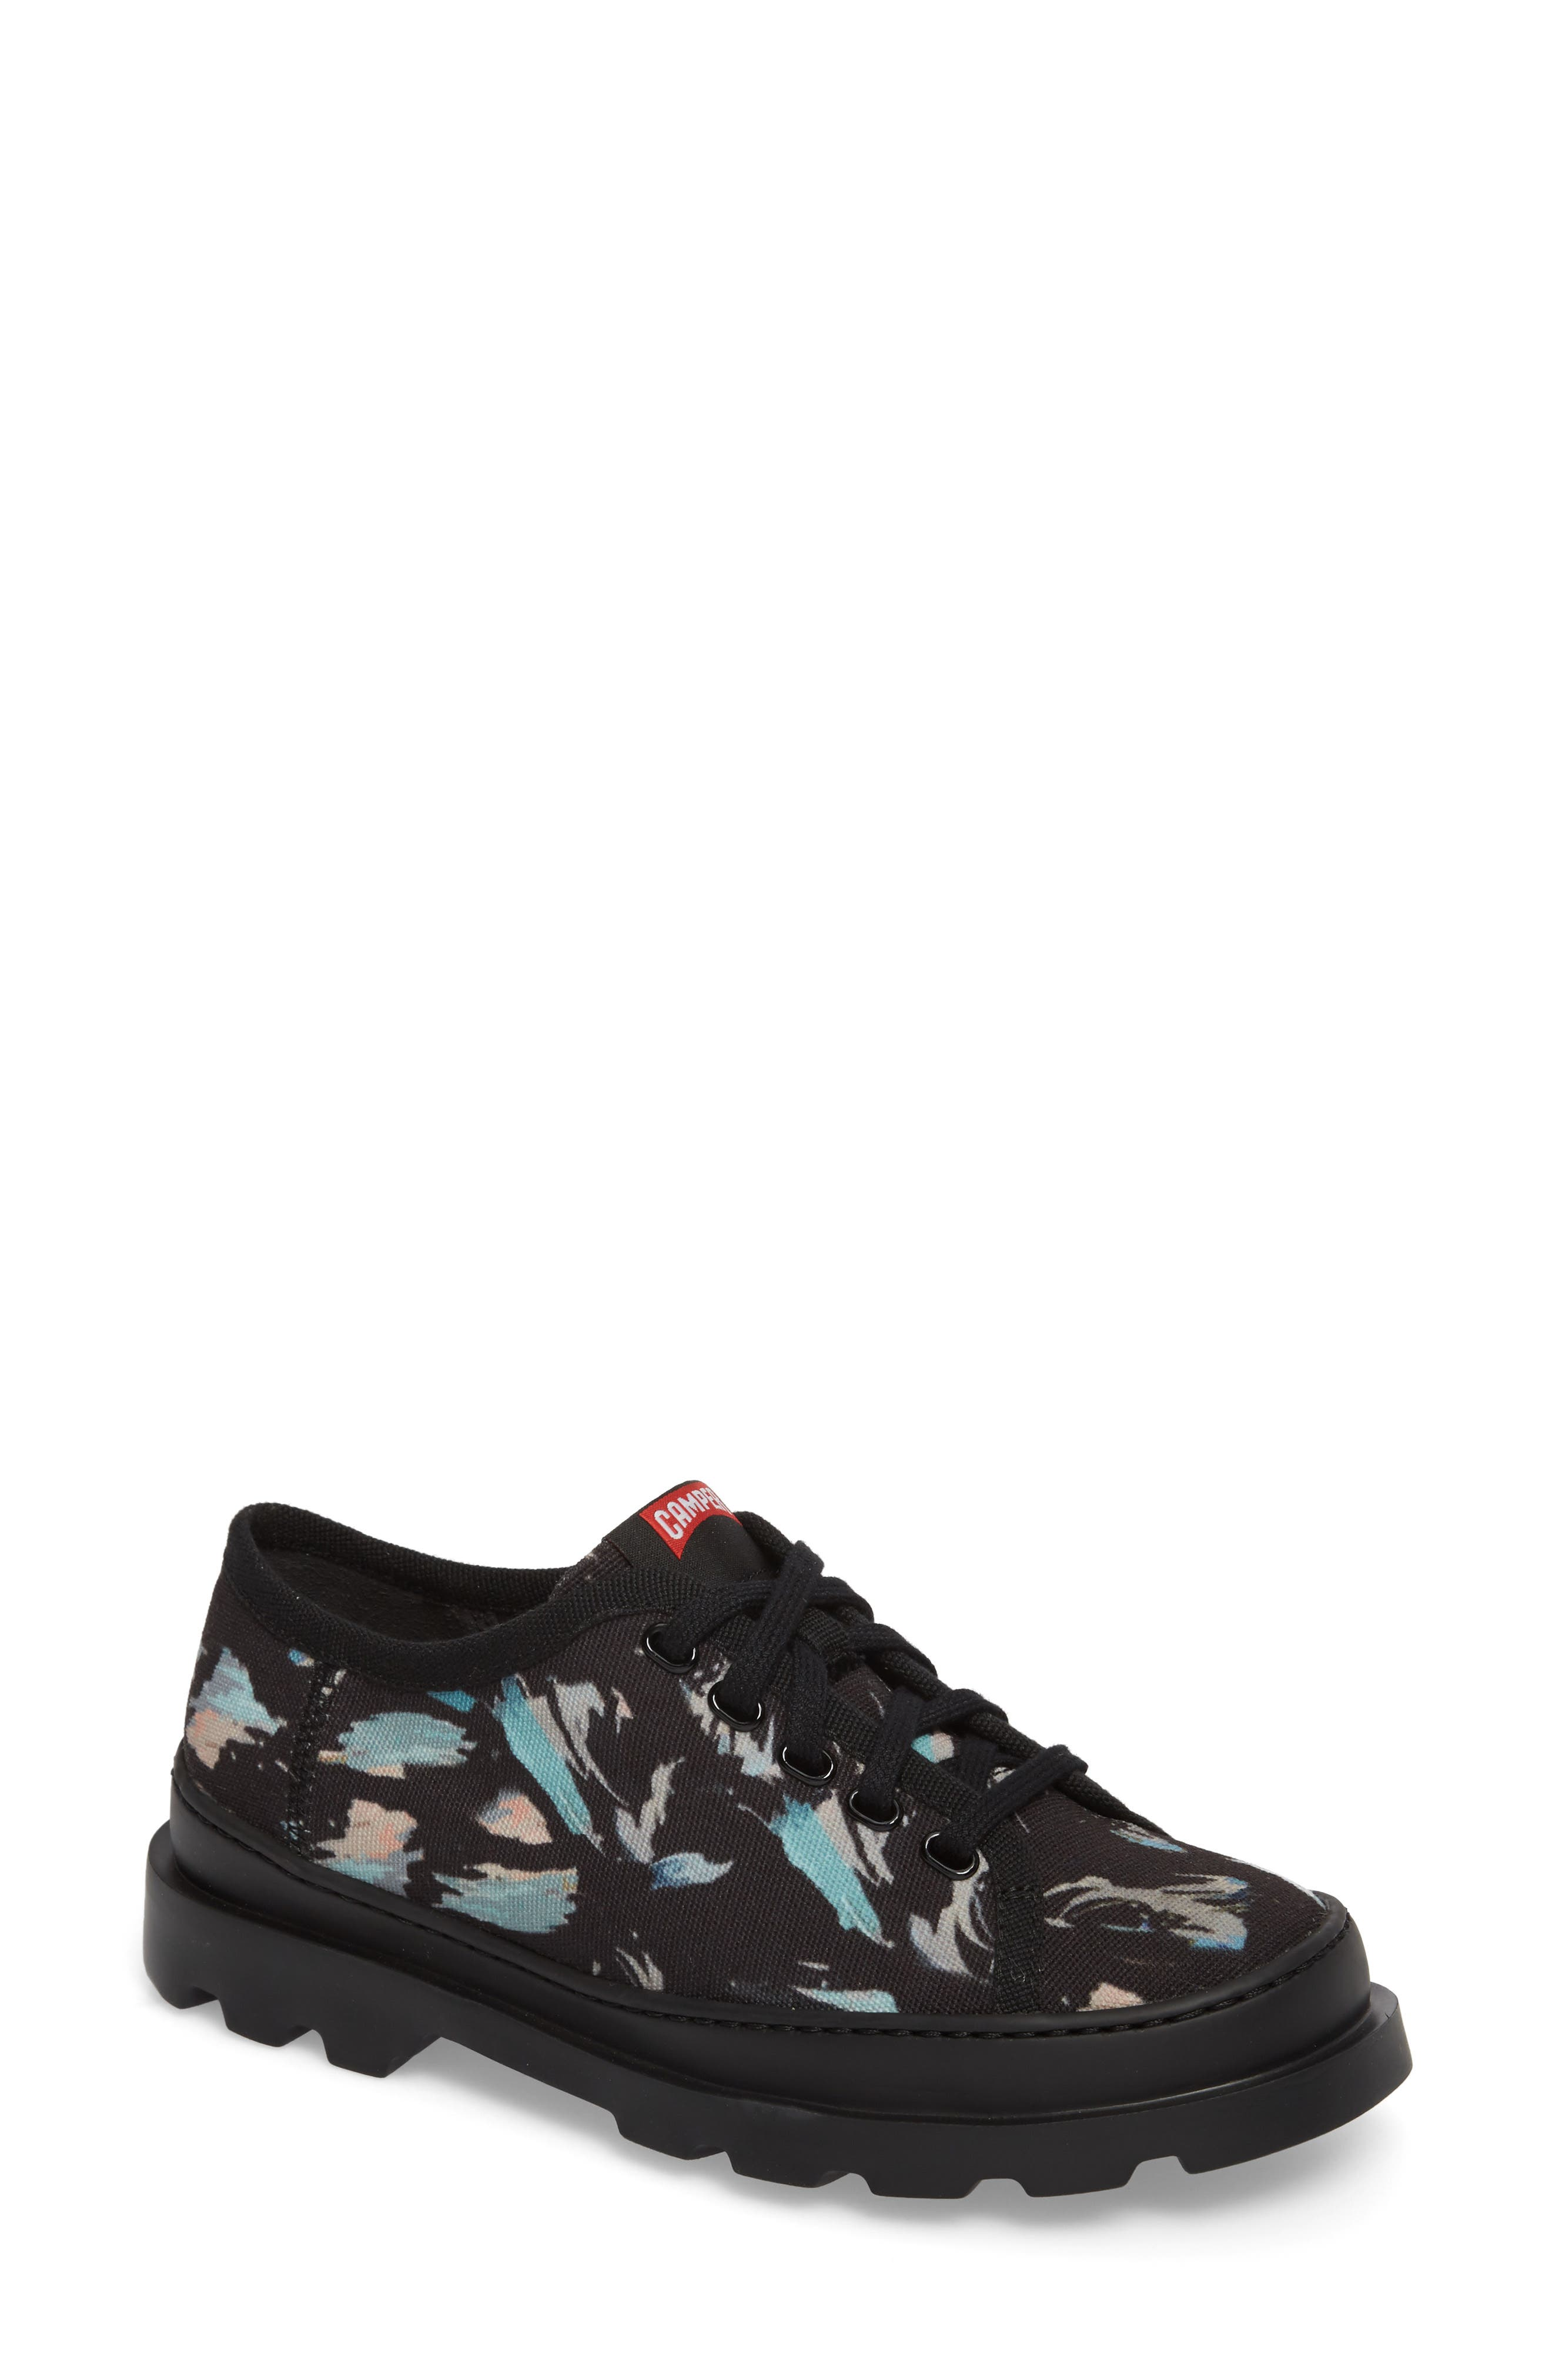 Brutus Lugged Platform Sneaker,                         Main,                         color, Black Multi